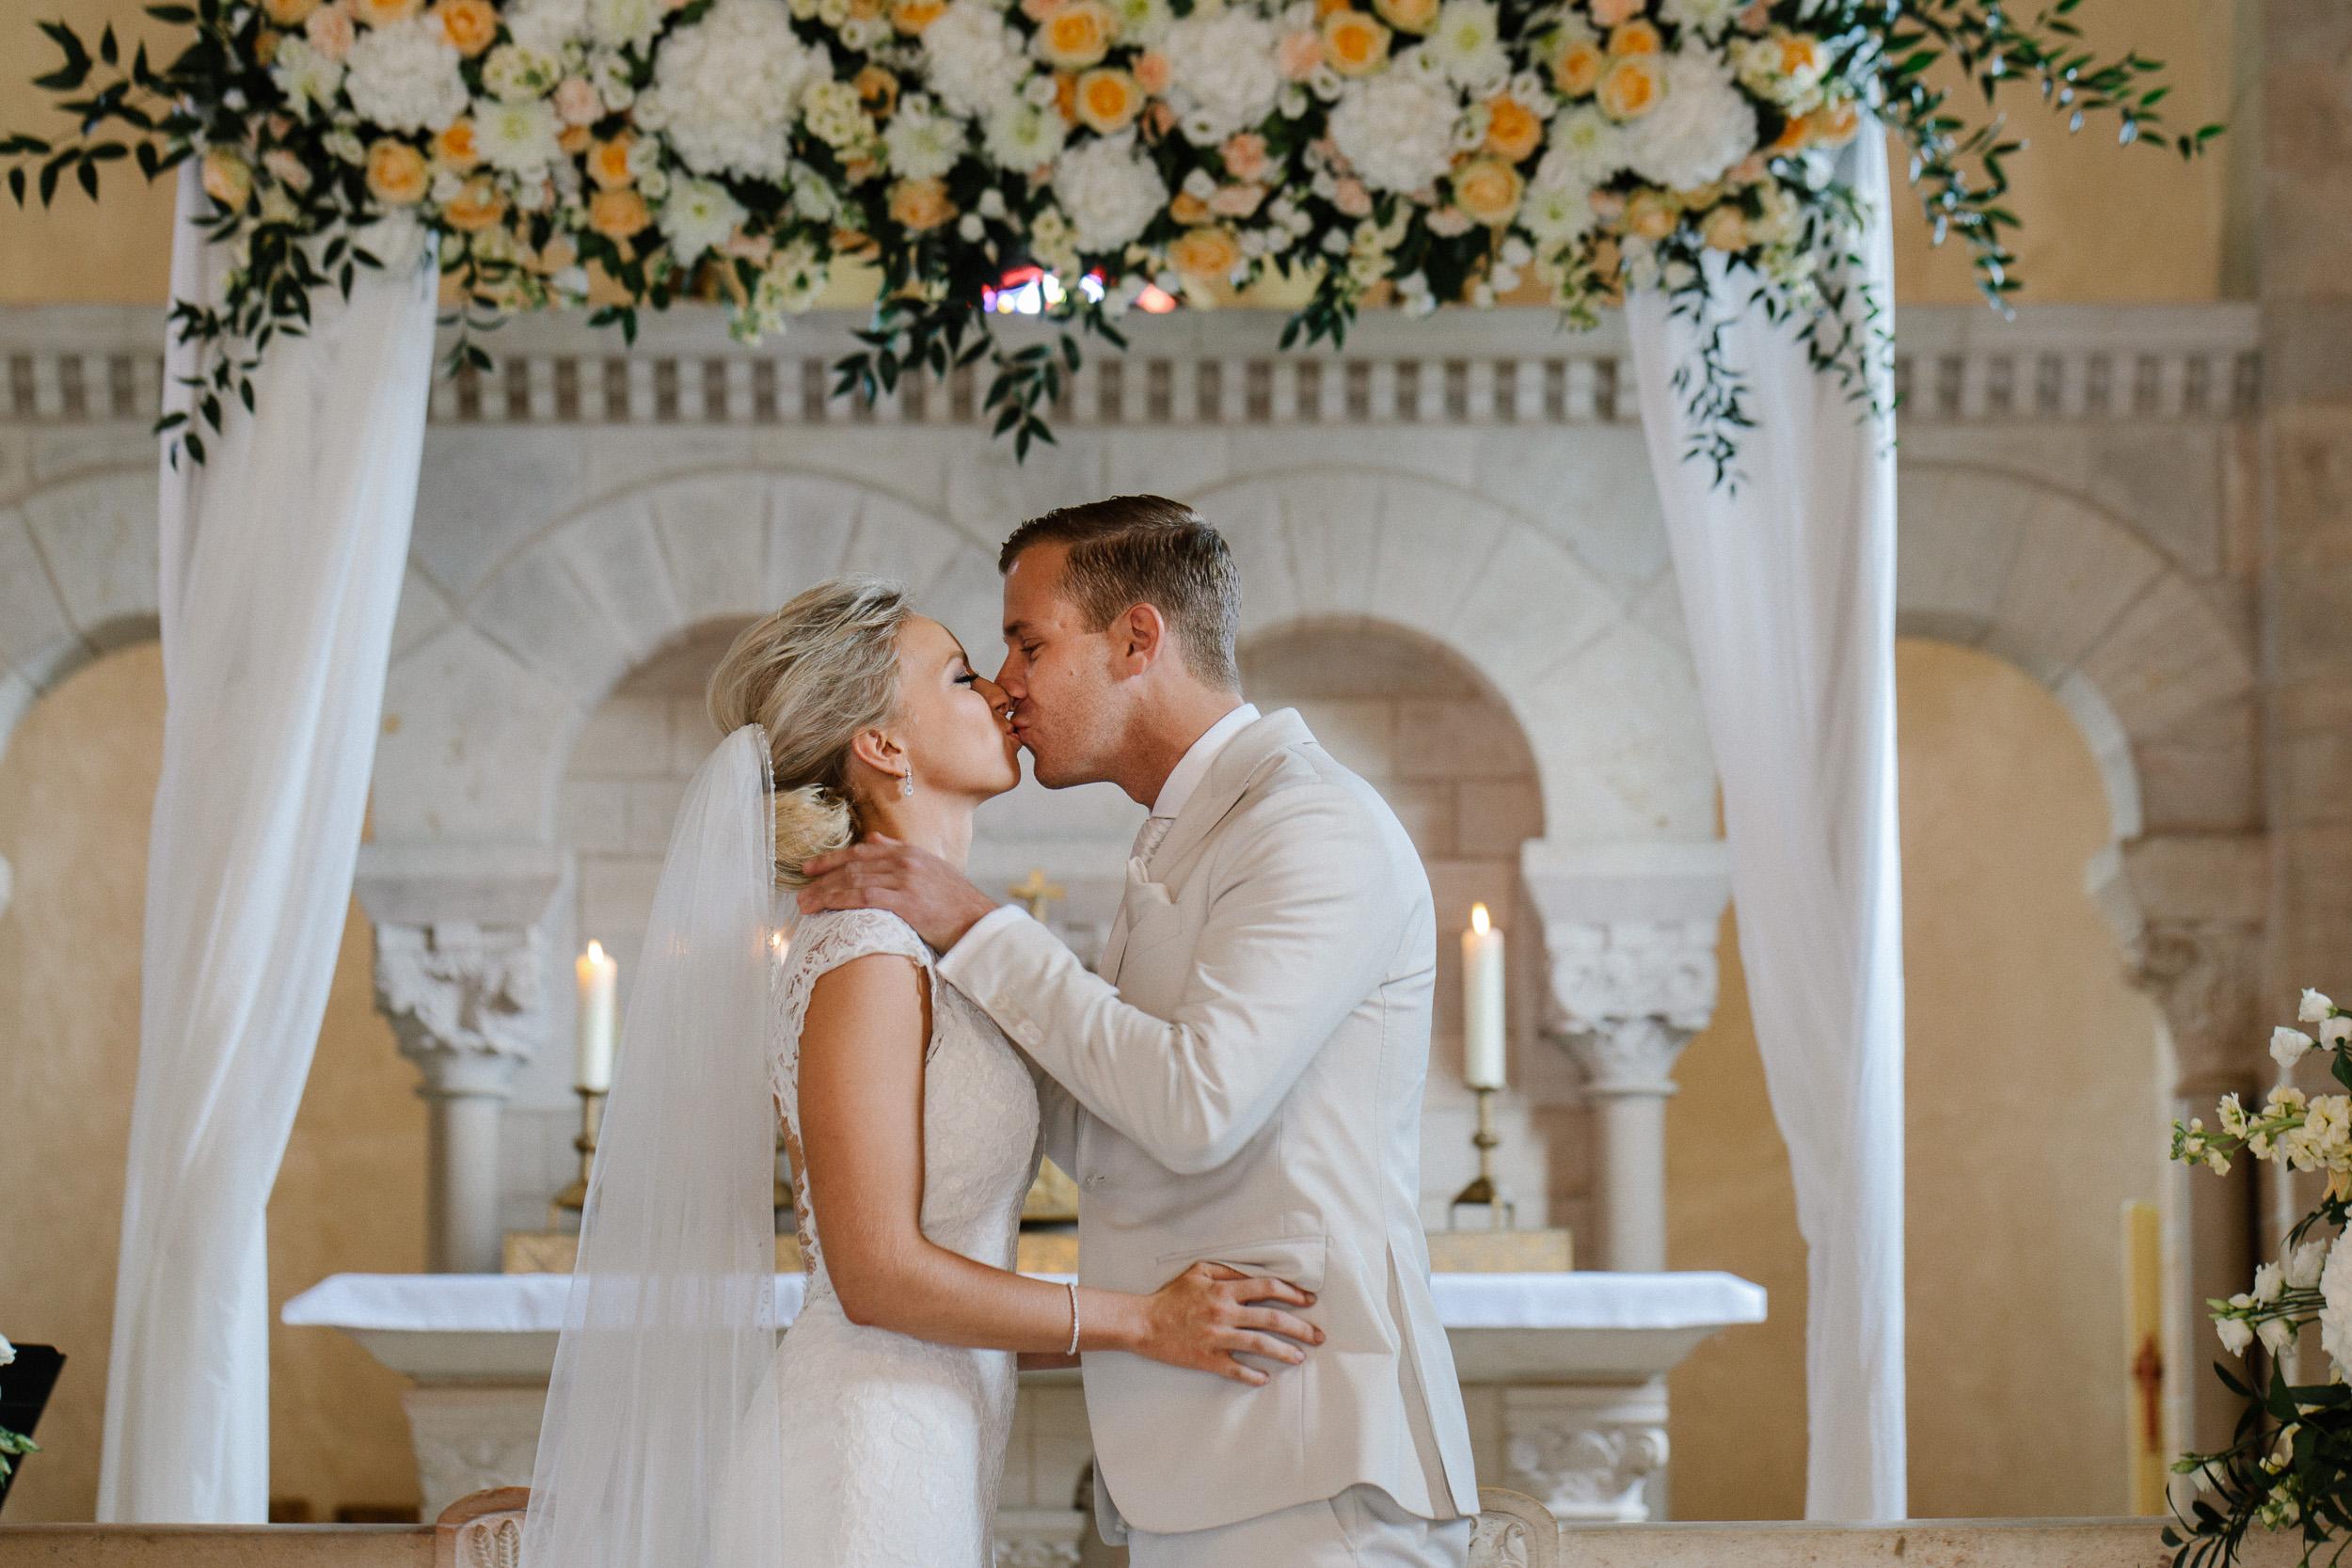 Wedding-Chateau-de-Varennes-051.jpg